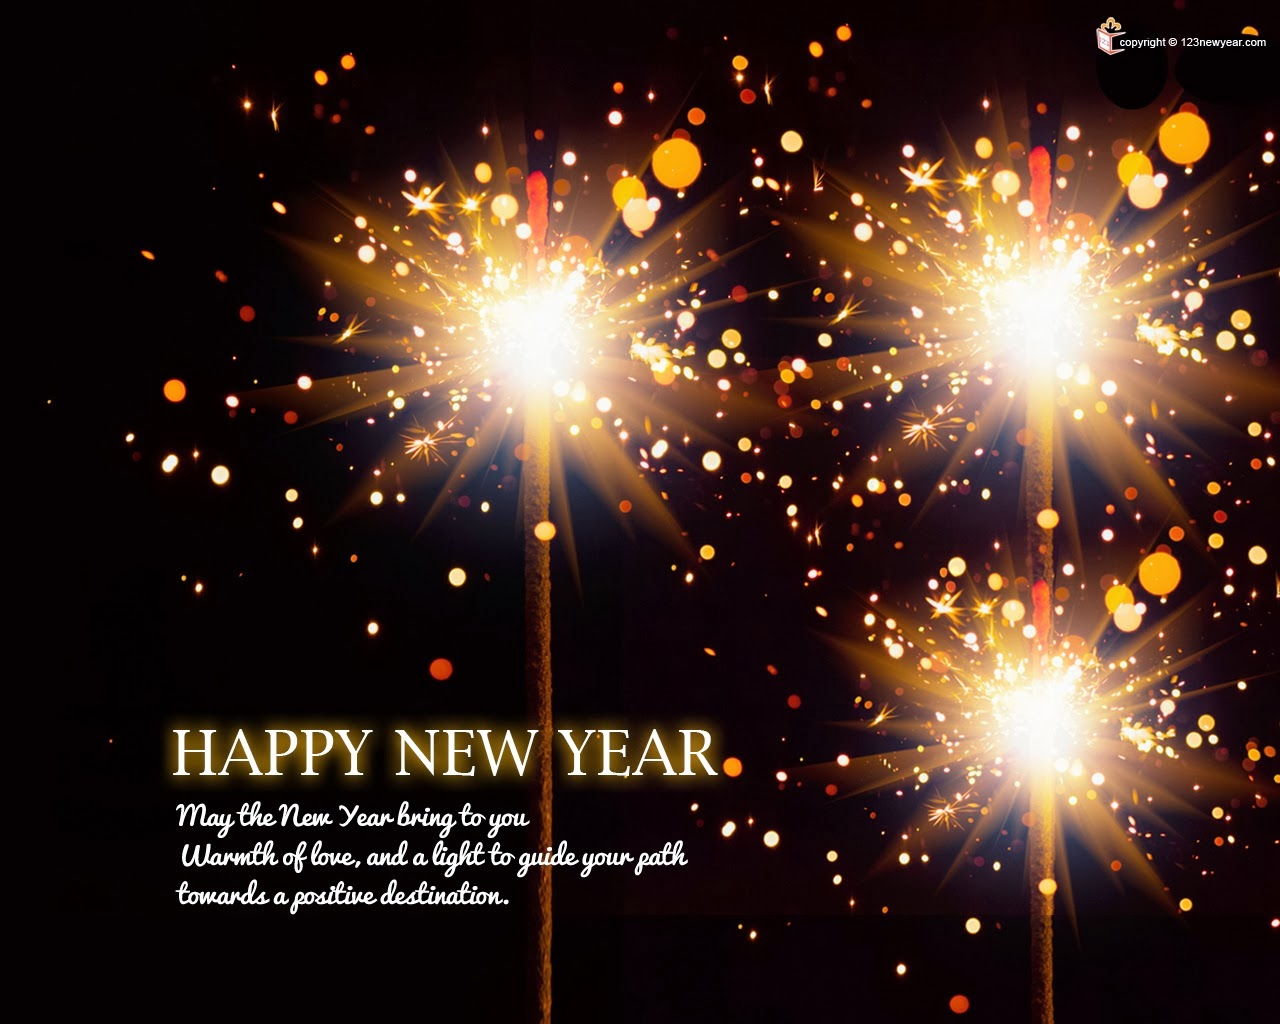 Ucapan selamat tahun baru 2015 newhairstylesformen2014 com